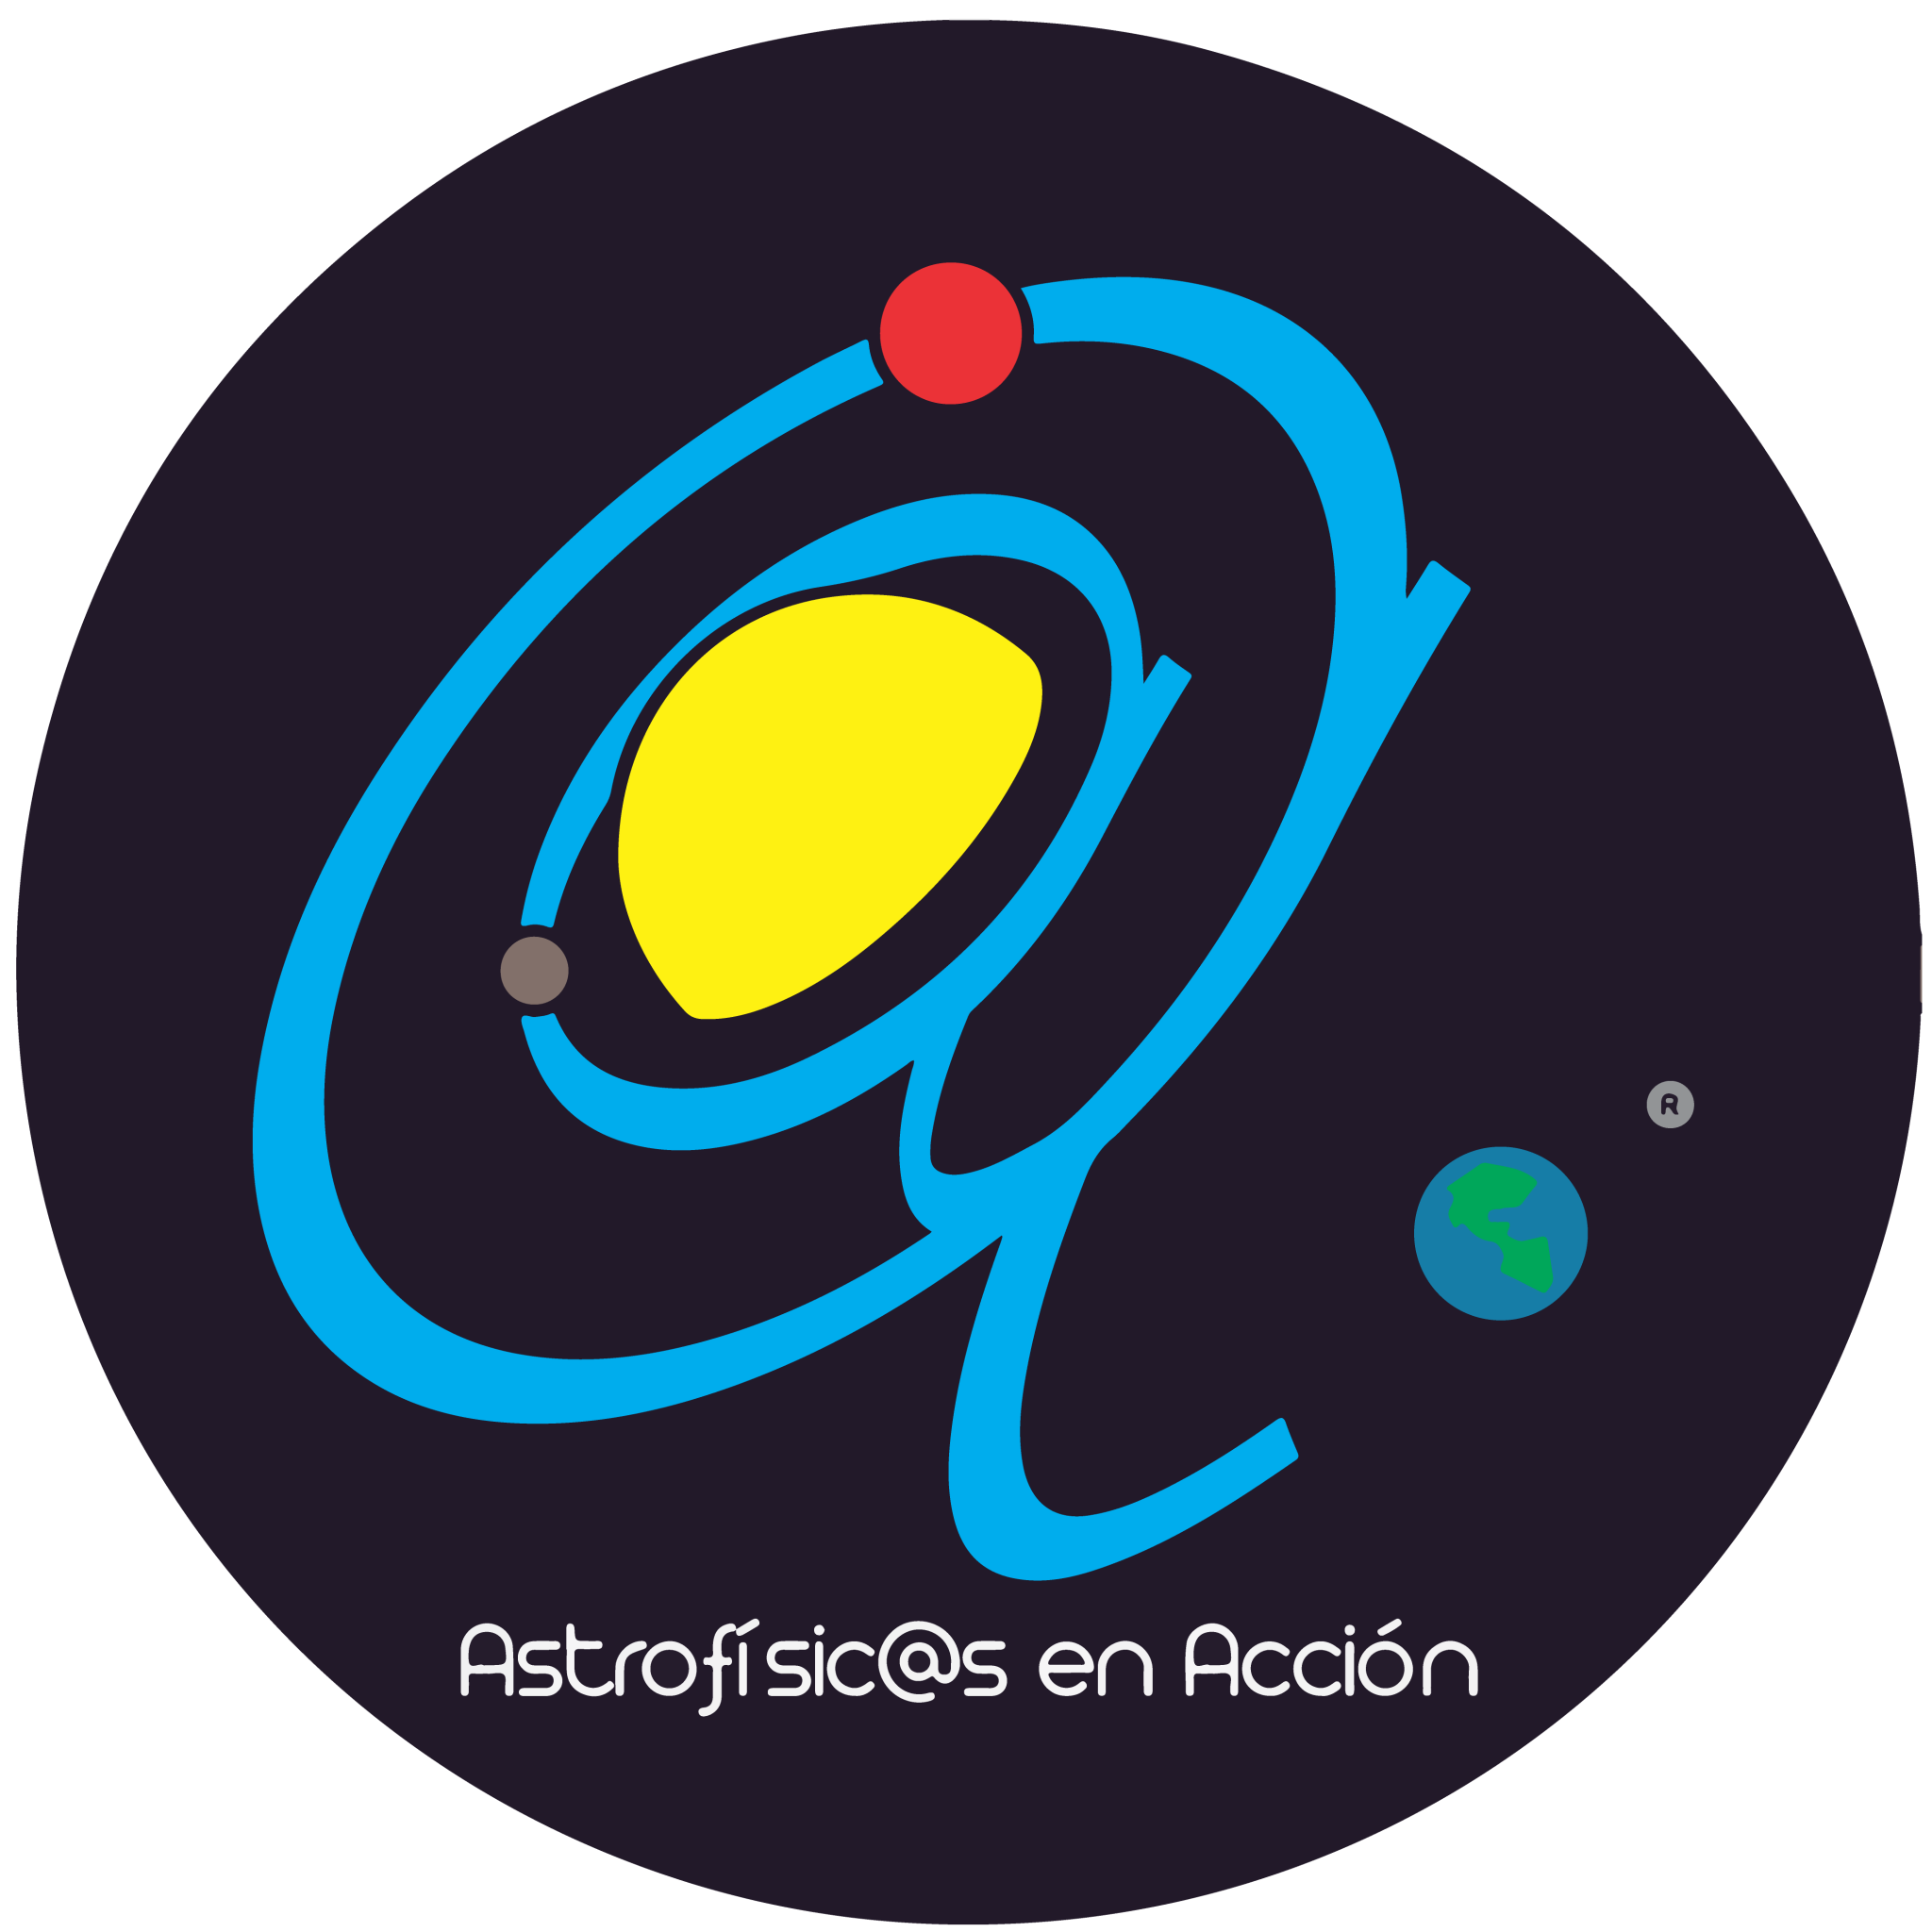 MH_Astrofisicos